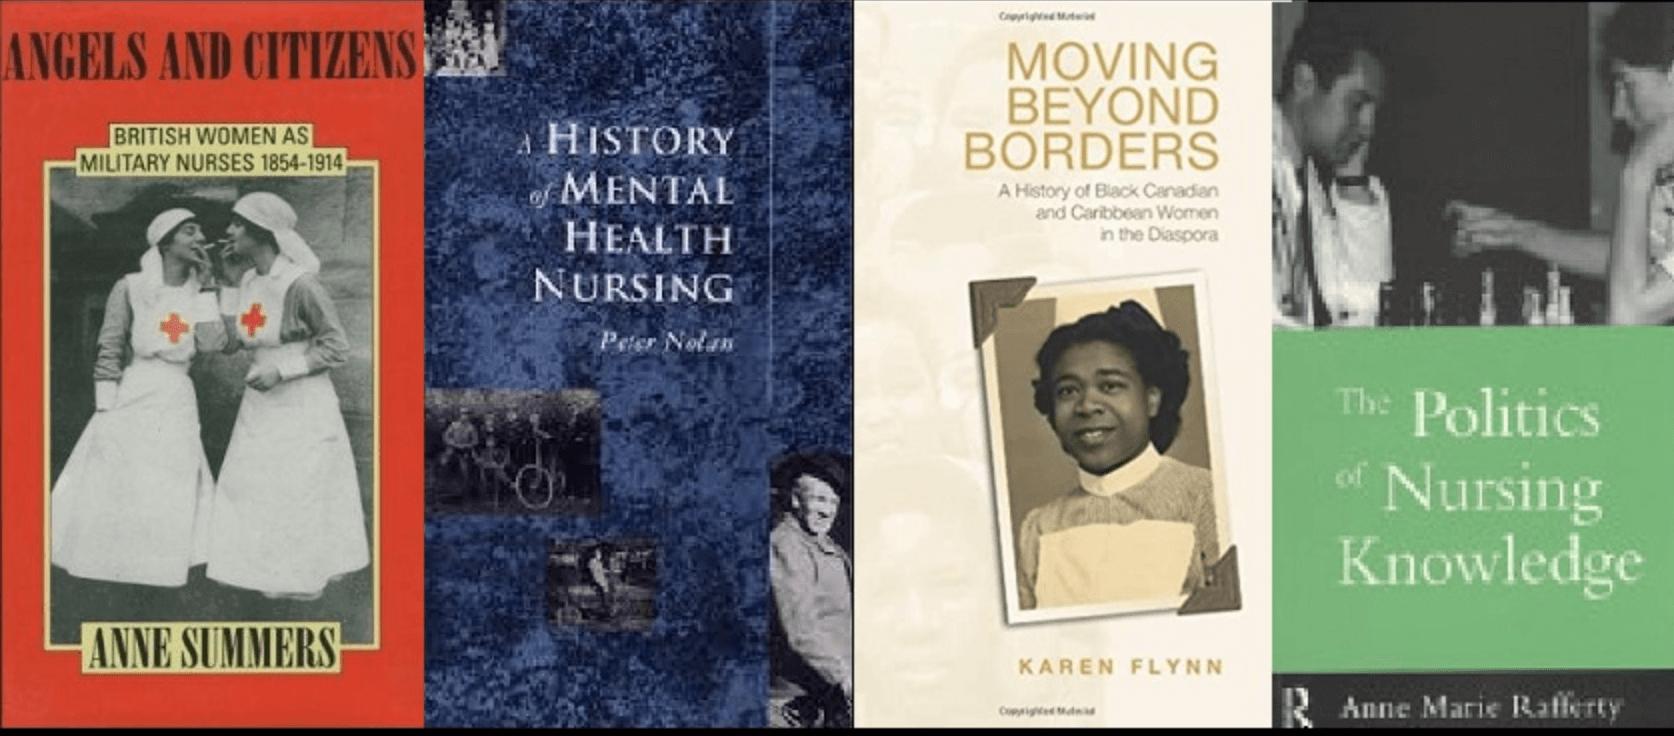 The Politics of Nursing History: Identities and Boundaries